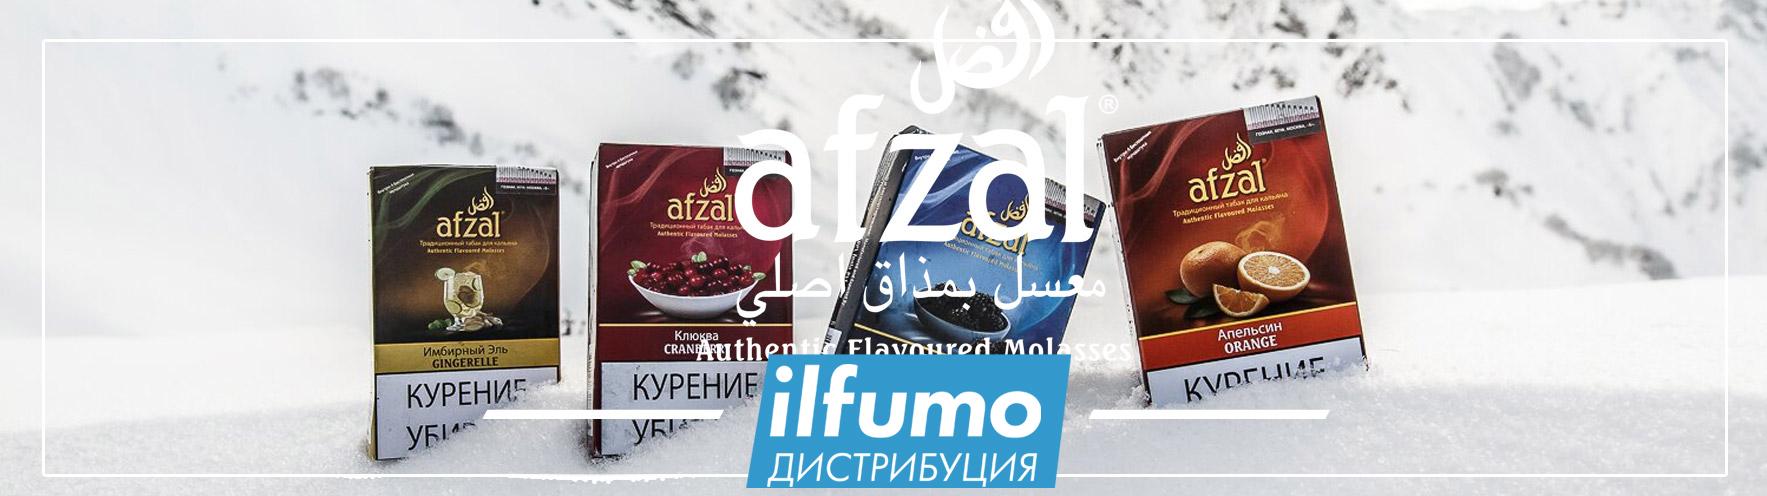 Табак для кальяна «Afzal»